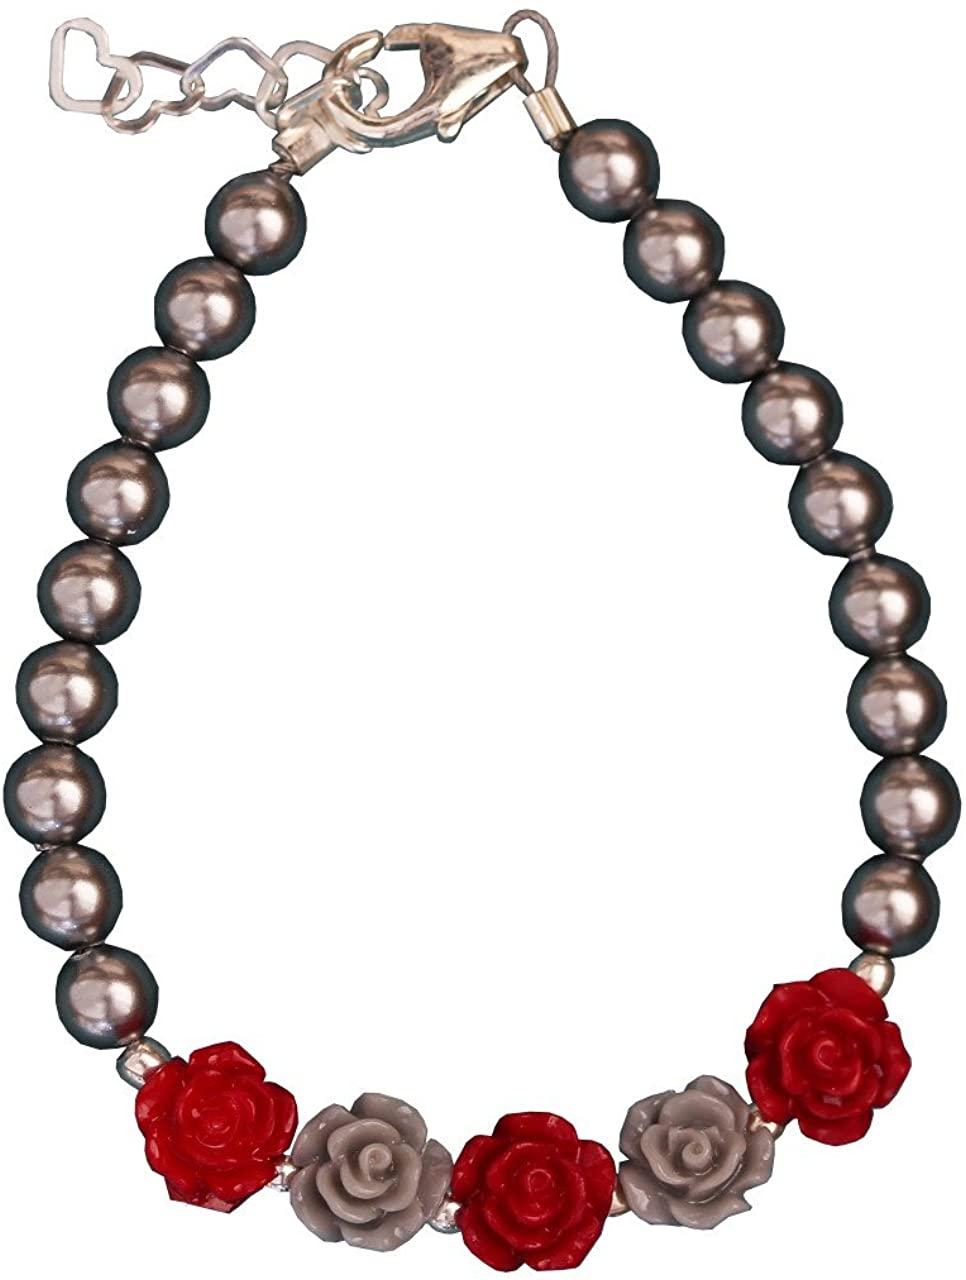 Crystal Dream Elegant Grey Swarovski Simulated Pearls Grey and Red Flowers Stylish Festive Infant Girl Bracelet (B100-FGR_M)